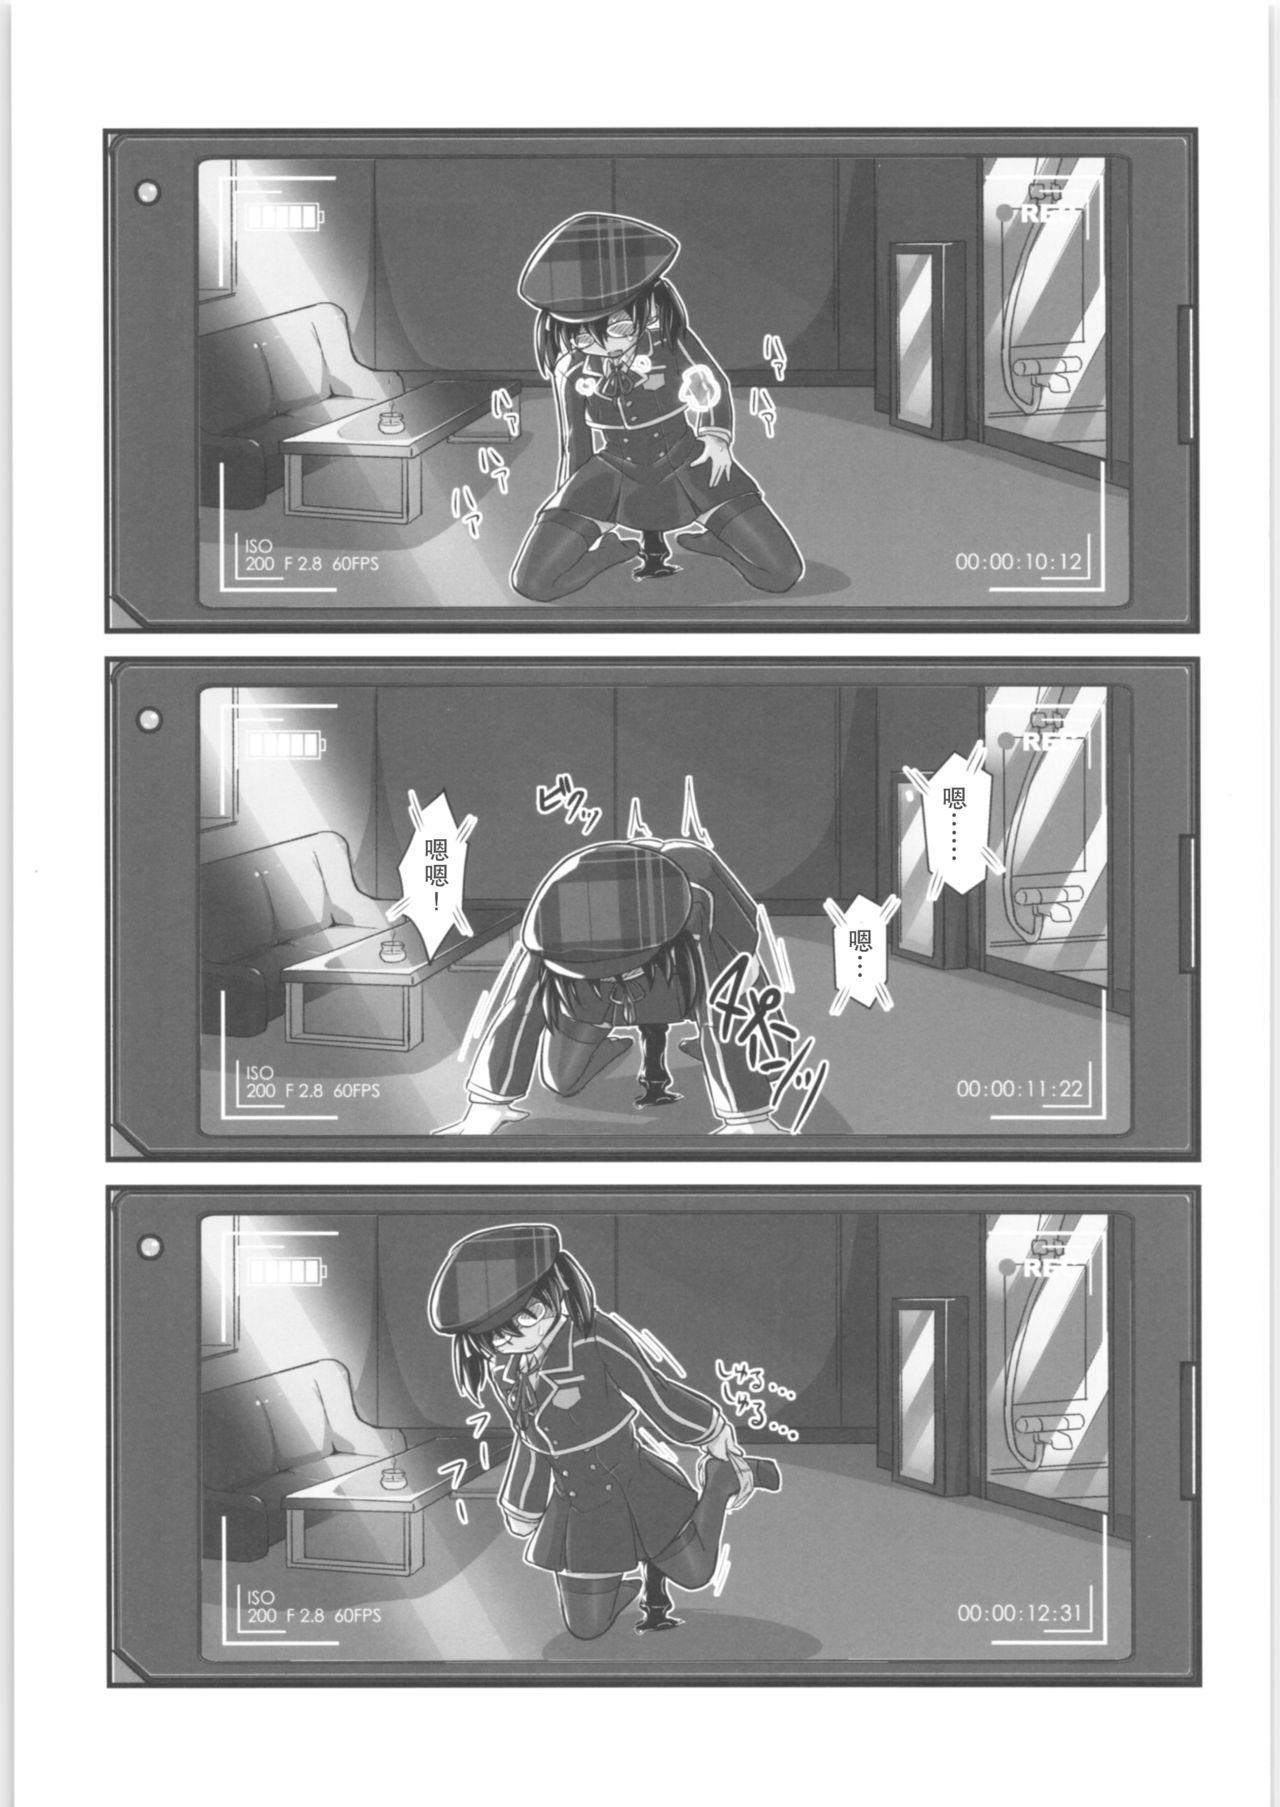 [Umari-ya (D-2)] Kiriko Route Another #05 ~Seifuku Josou Anal Junchi Hen~ (Sword Art Online) ) [Chinese] [不可视汉化] 14